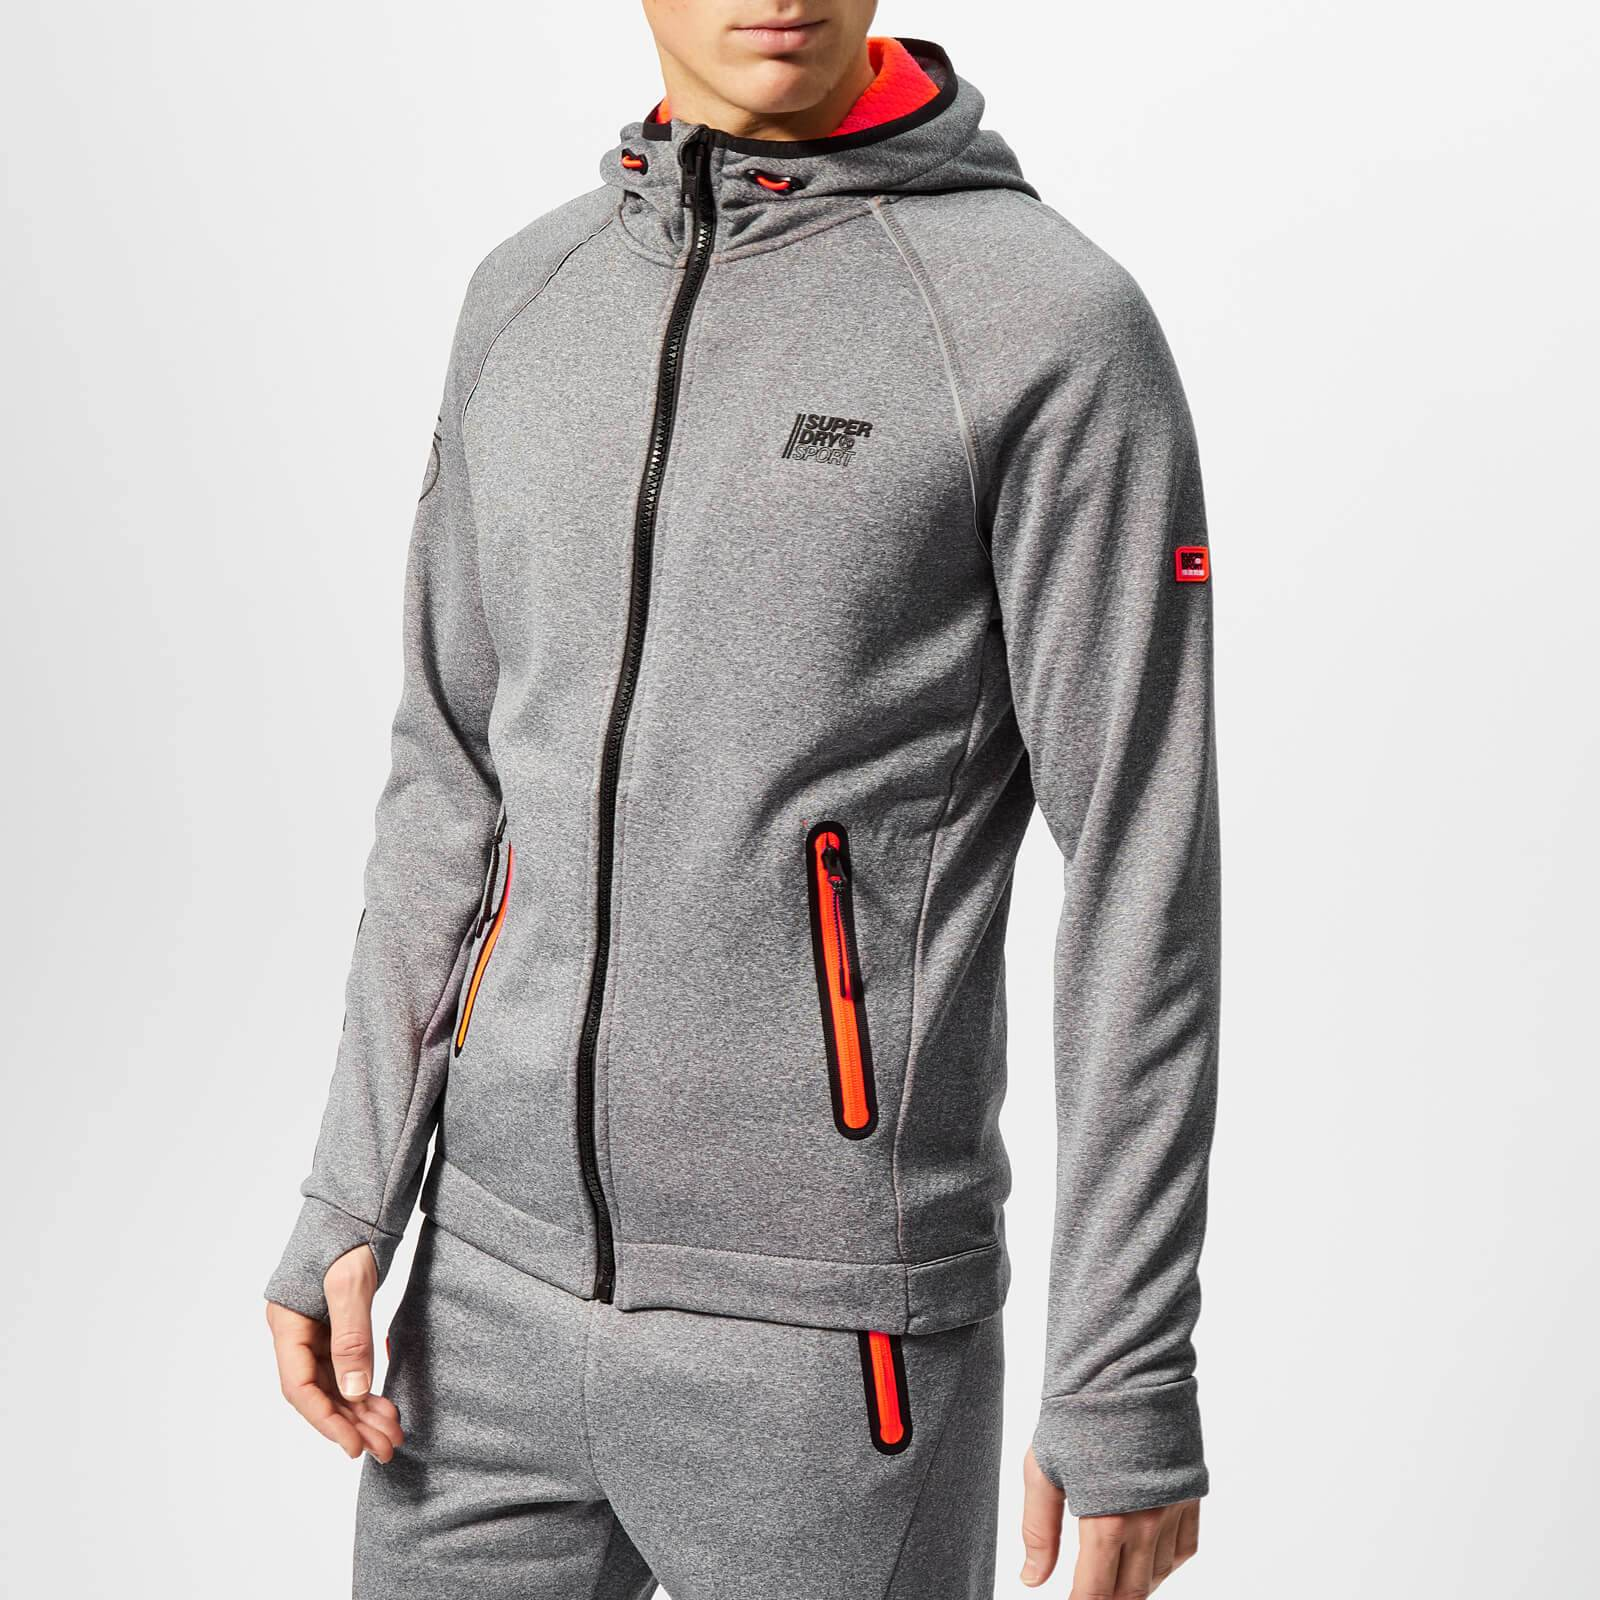 Superdry Sport Men's Winter Training Zip Hoody - Black Grit - L - Grey